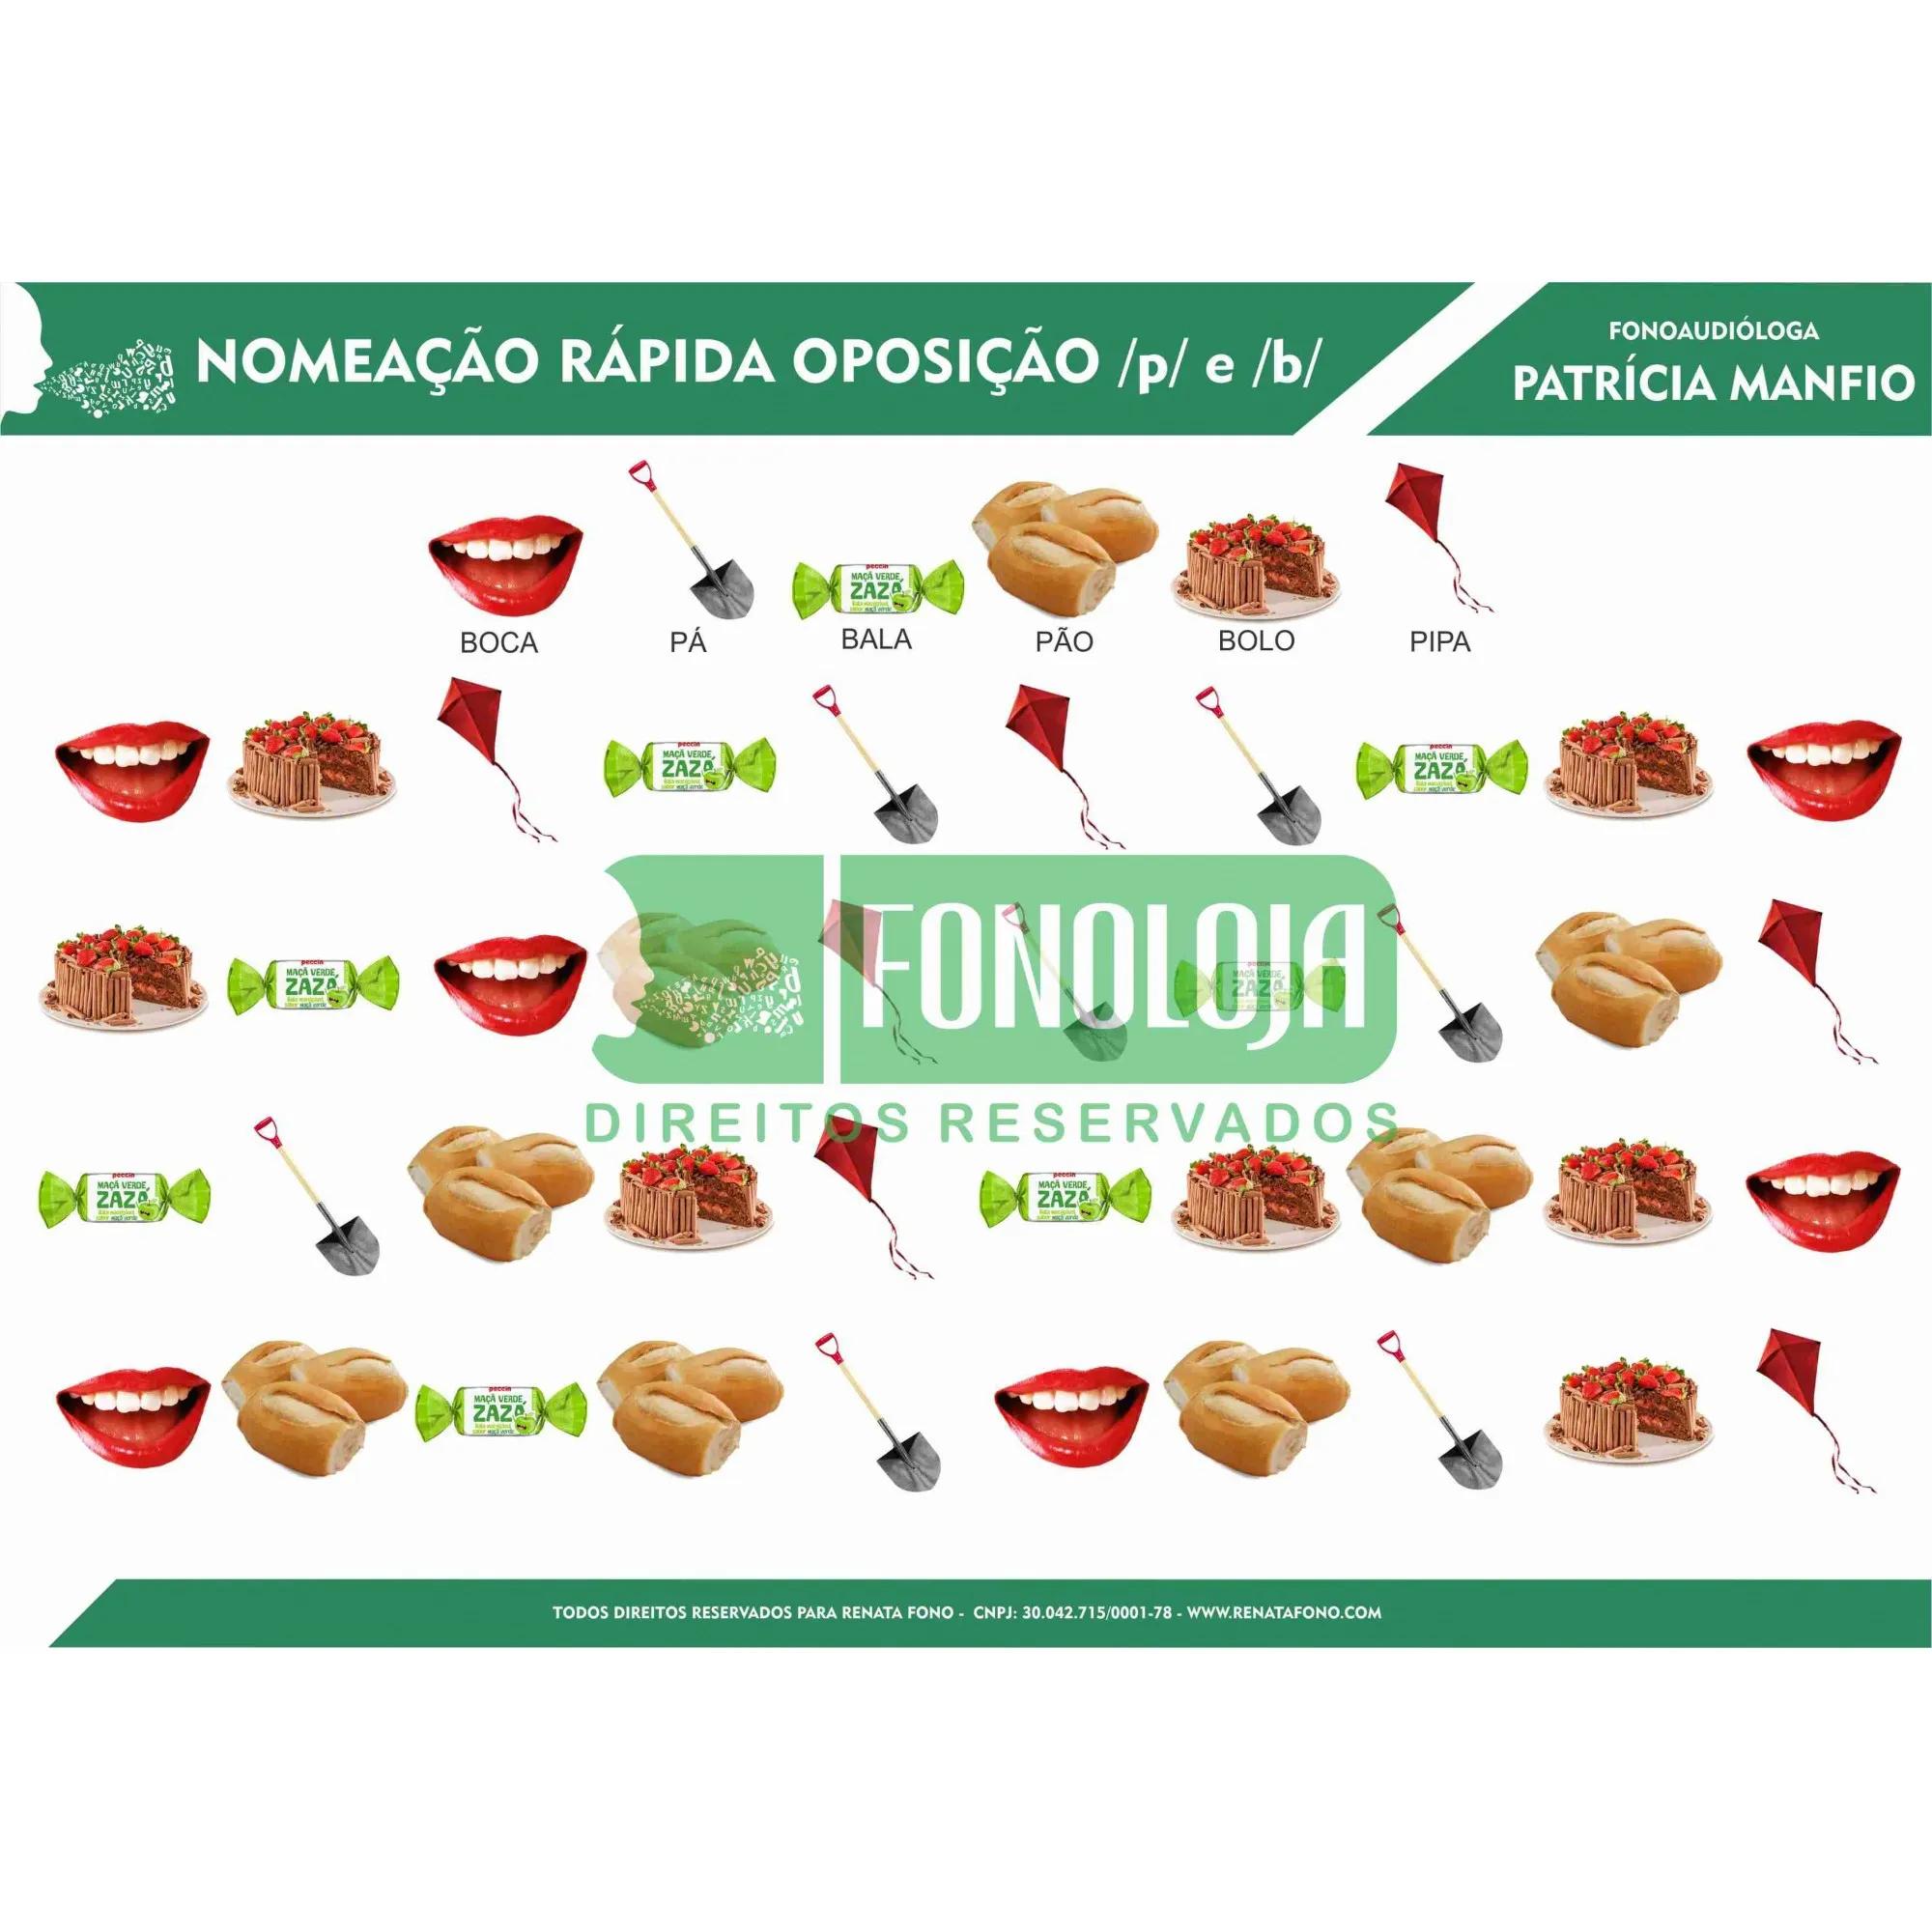 KIT 18 - 19 PRANCHAS SURDO E SONORO COMPLETO - FORMATO DIGITAL